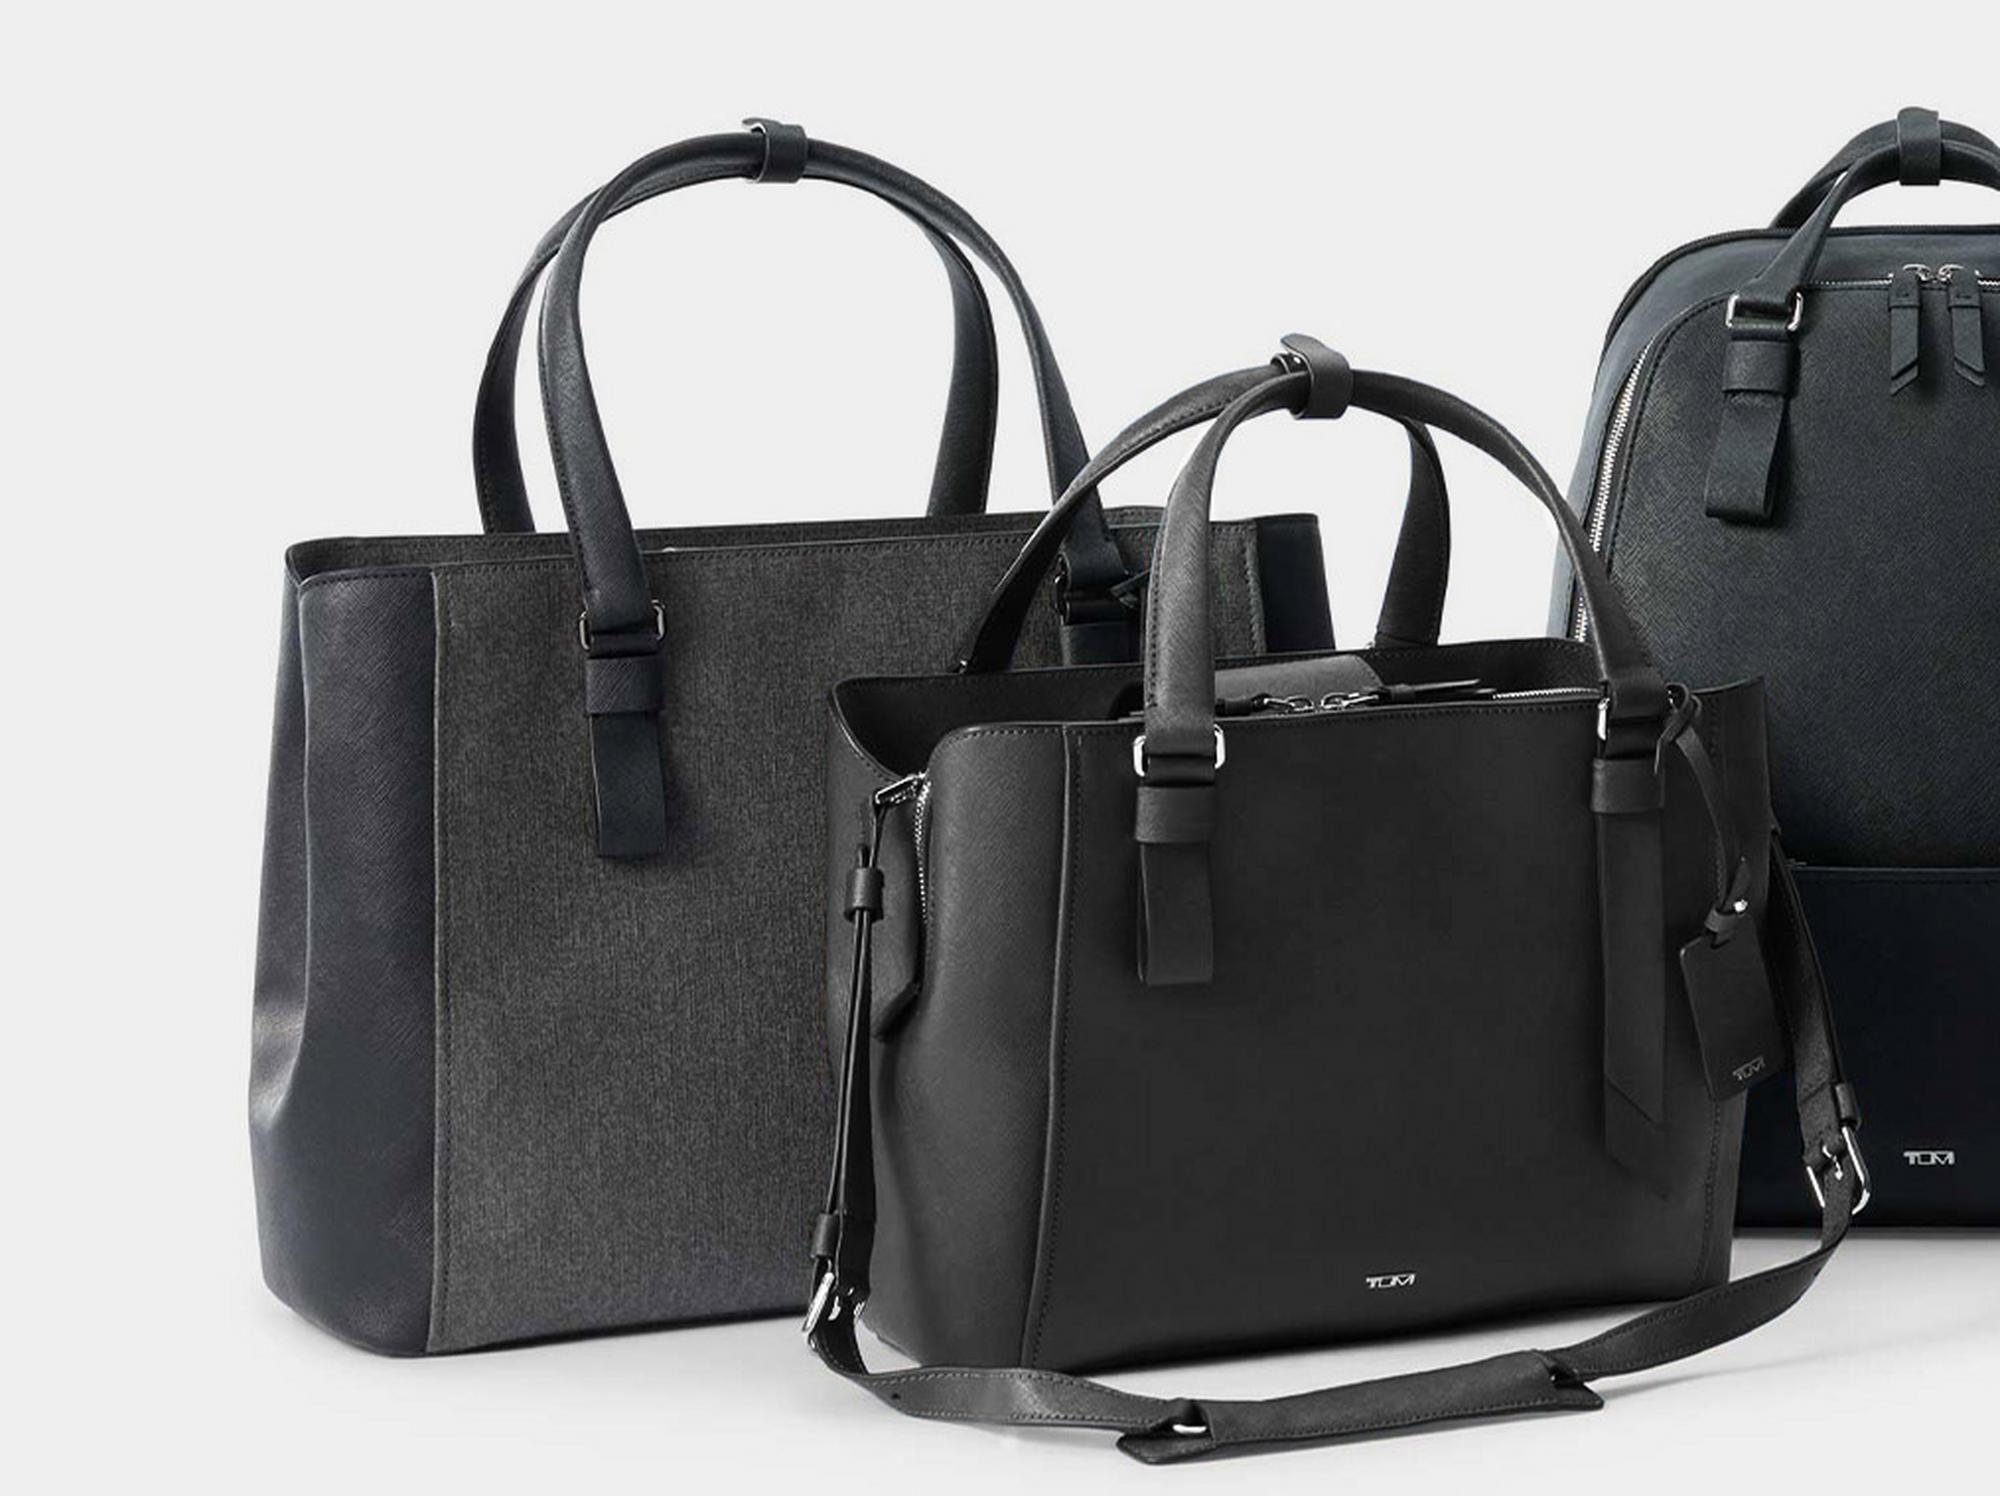 Luggage, Backpacks, Bags & More - TUMI US